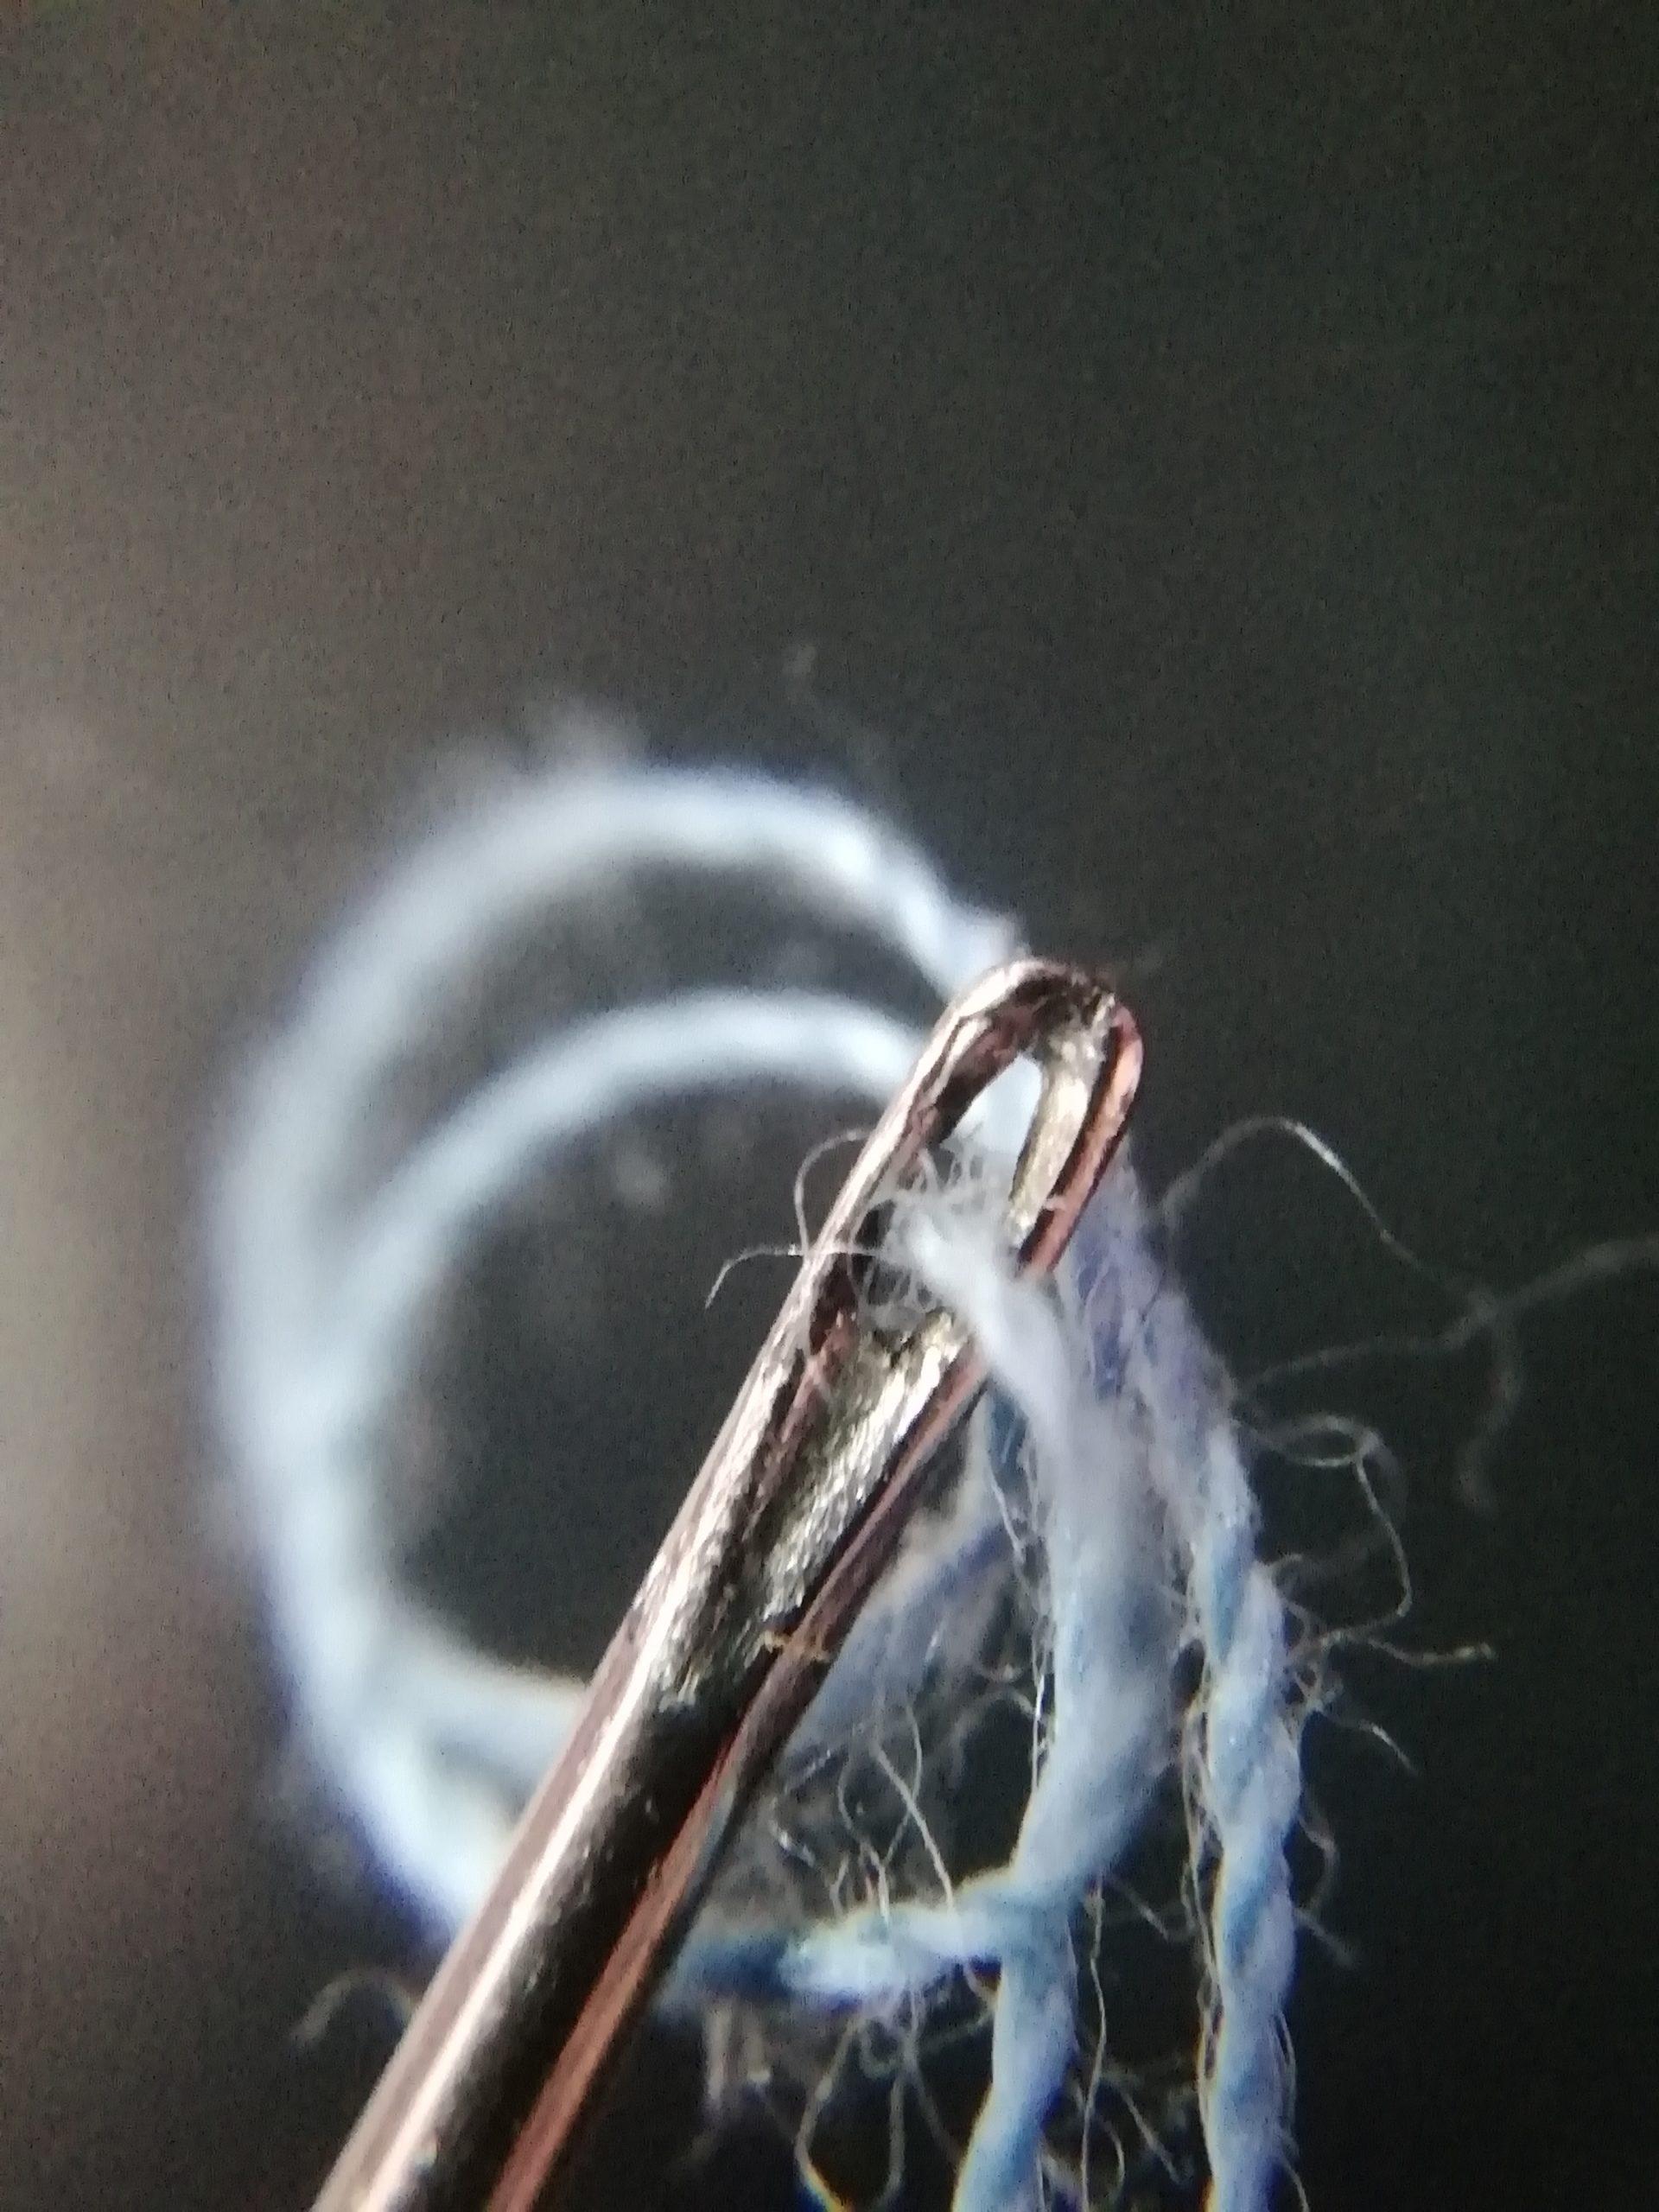 Thread in the needle